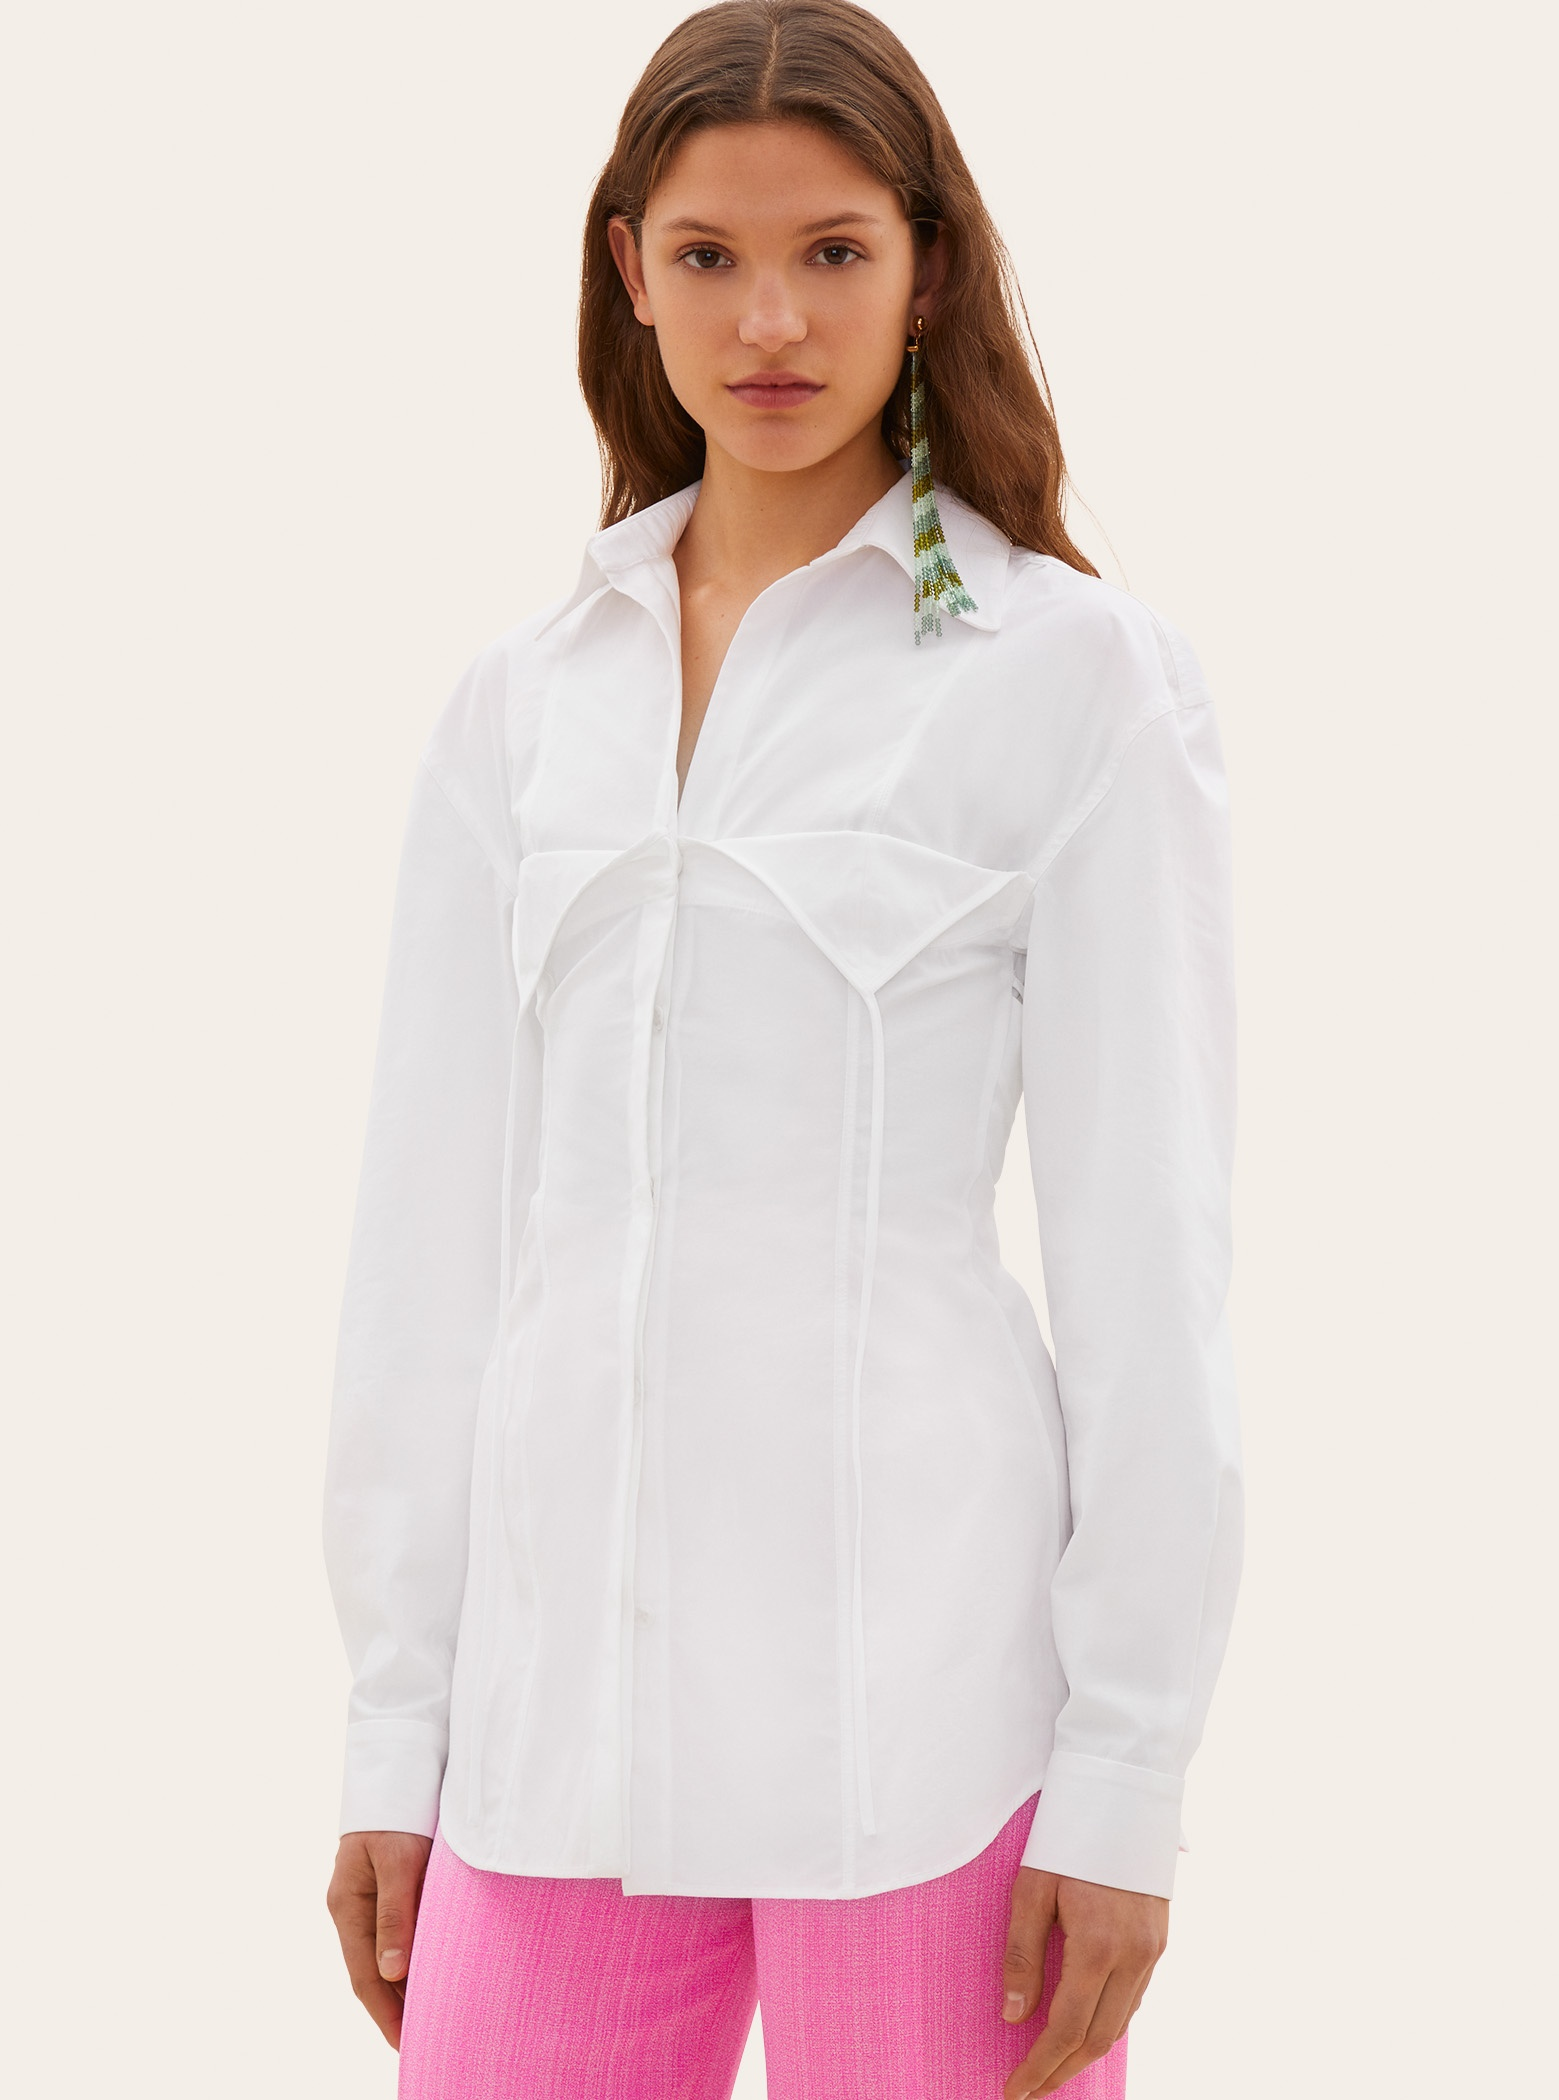 La chemise Valensole